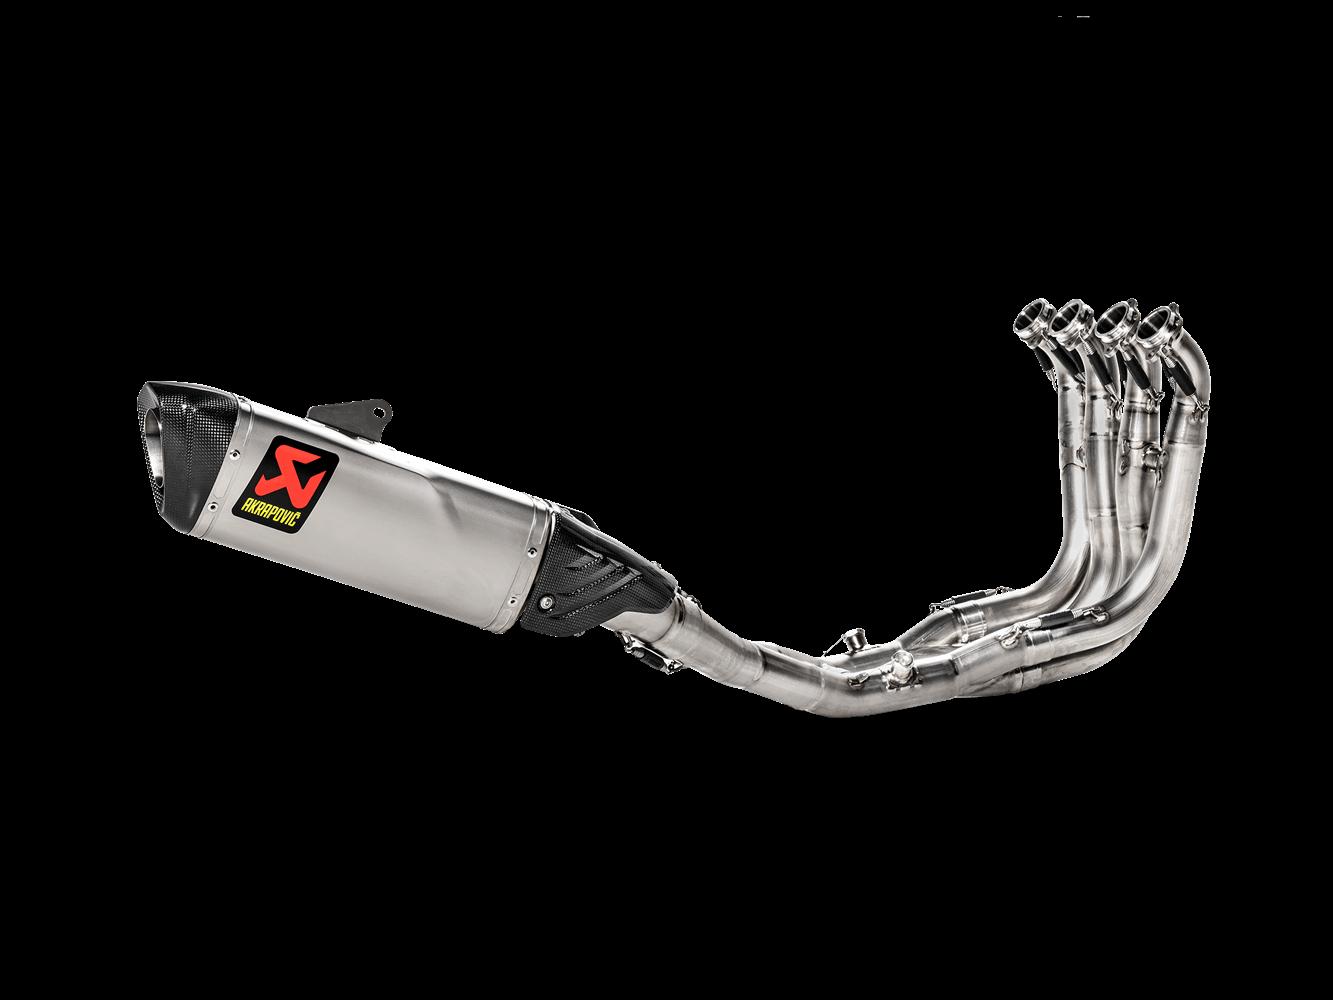 ESCAPAMENTO AKRAPOVIC FULL SYSTEM RACING LINE - BMW S1000RR 2020/2021